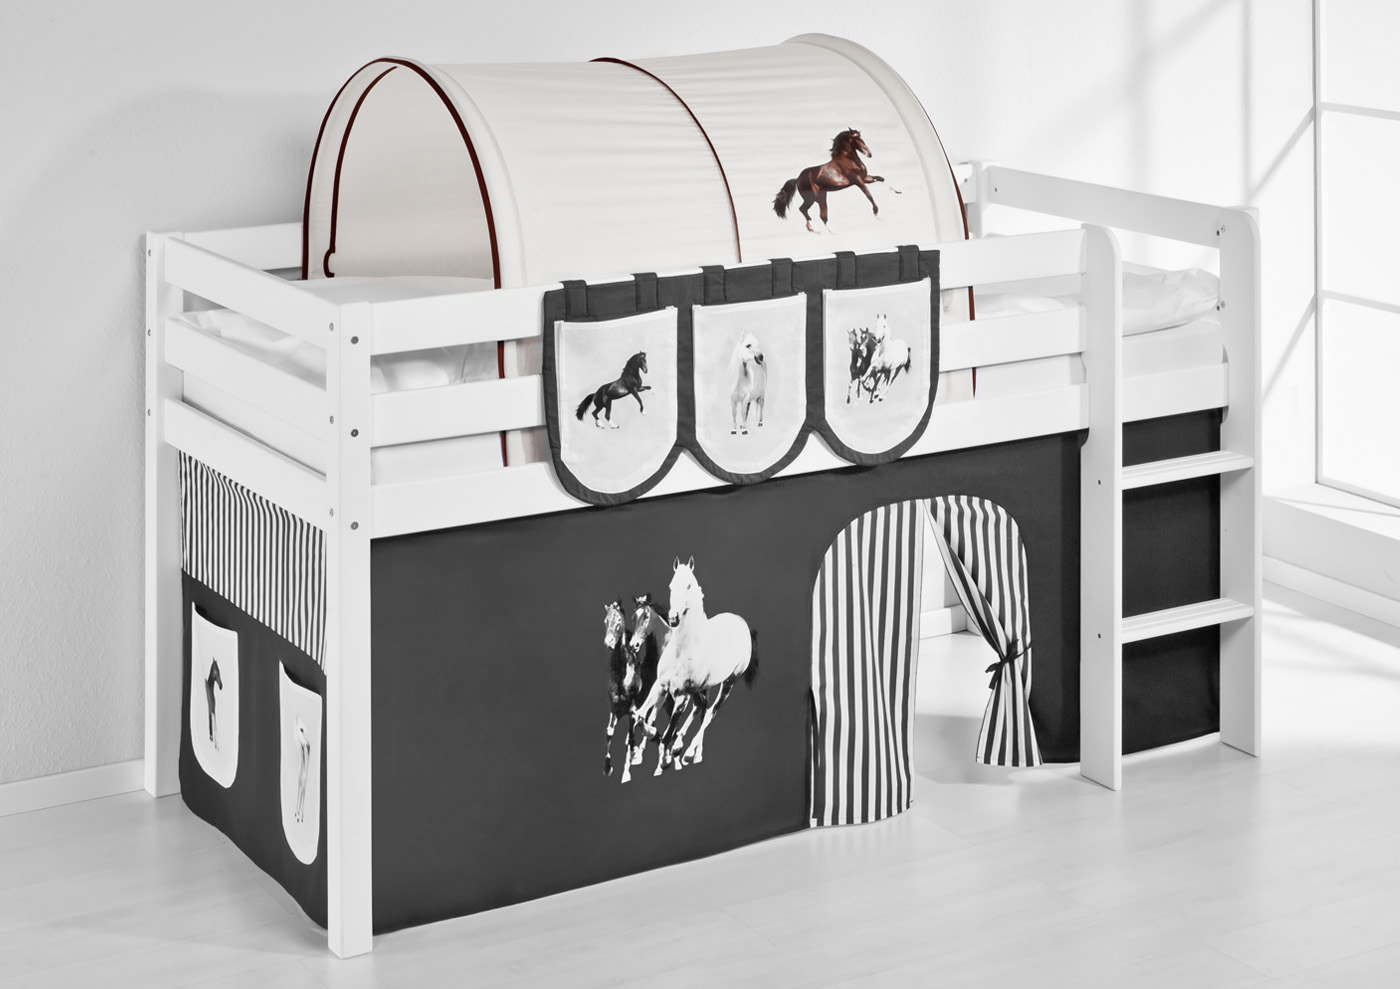 hochbett etagenbett l form larno buche massiv weiss inkl regal 791954167597 ebay. Black Bedroom Furniture Sets. Home Design Ideas